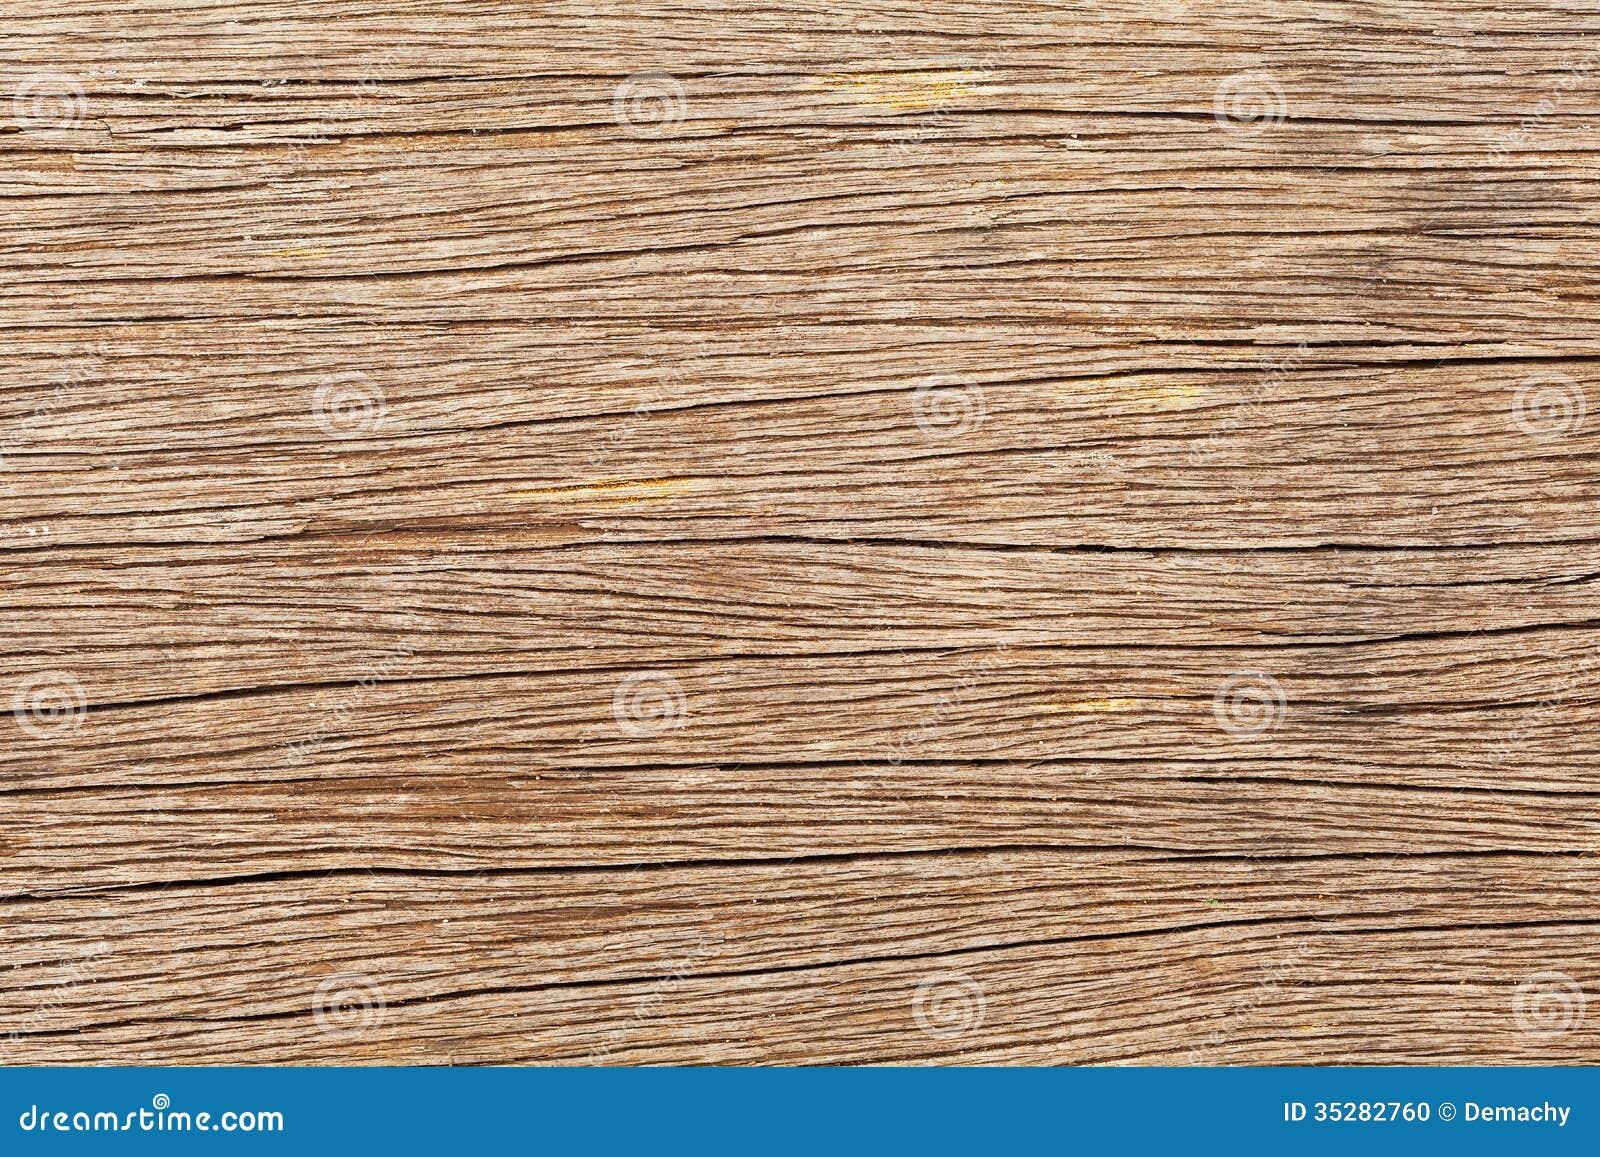 Old Oak Wood ~ Old oak wood plank stock photo image